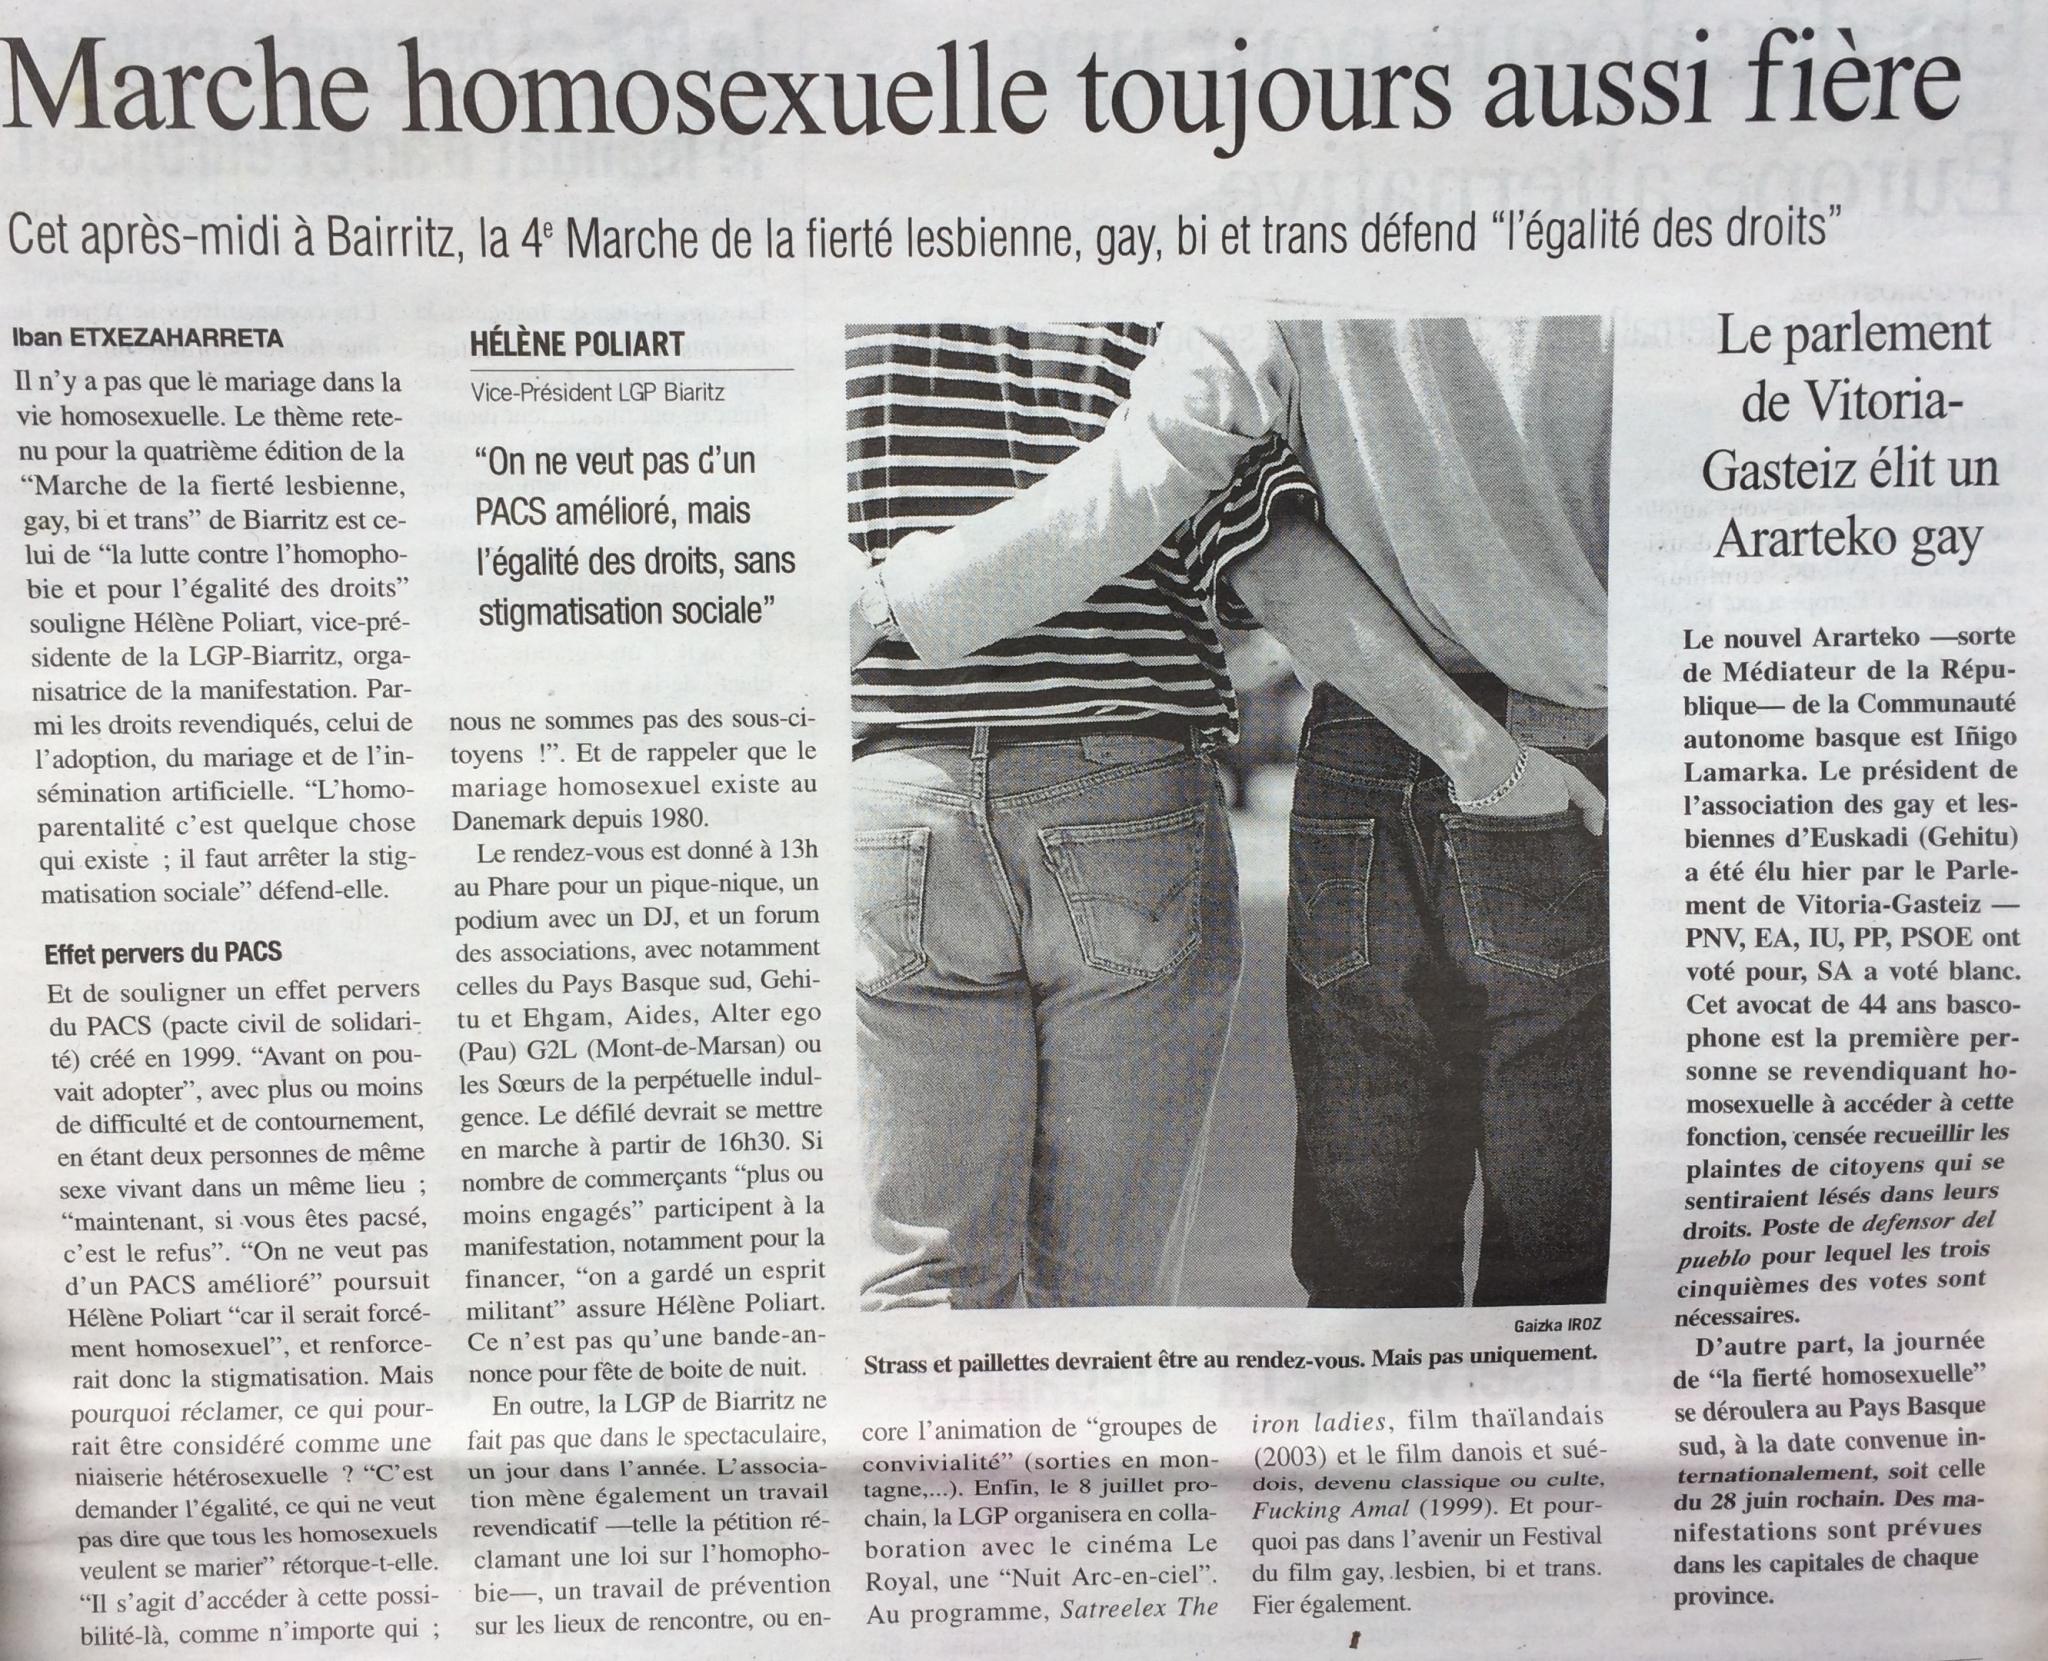 le journak du Pays Basque 20 juin 2004.jpg